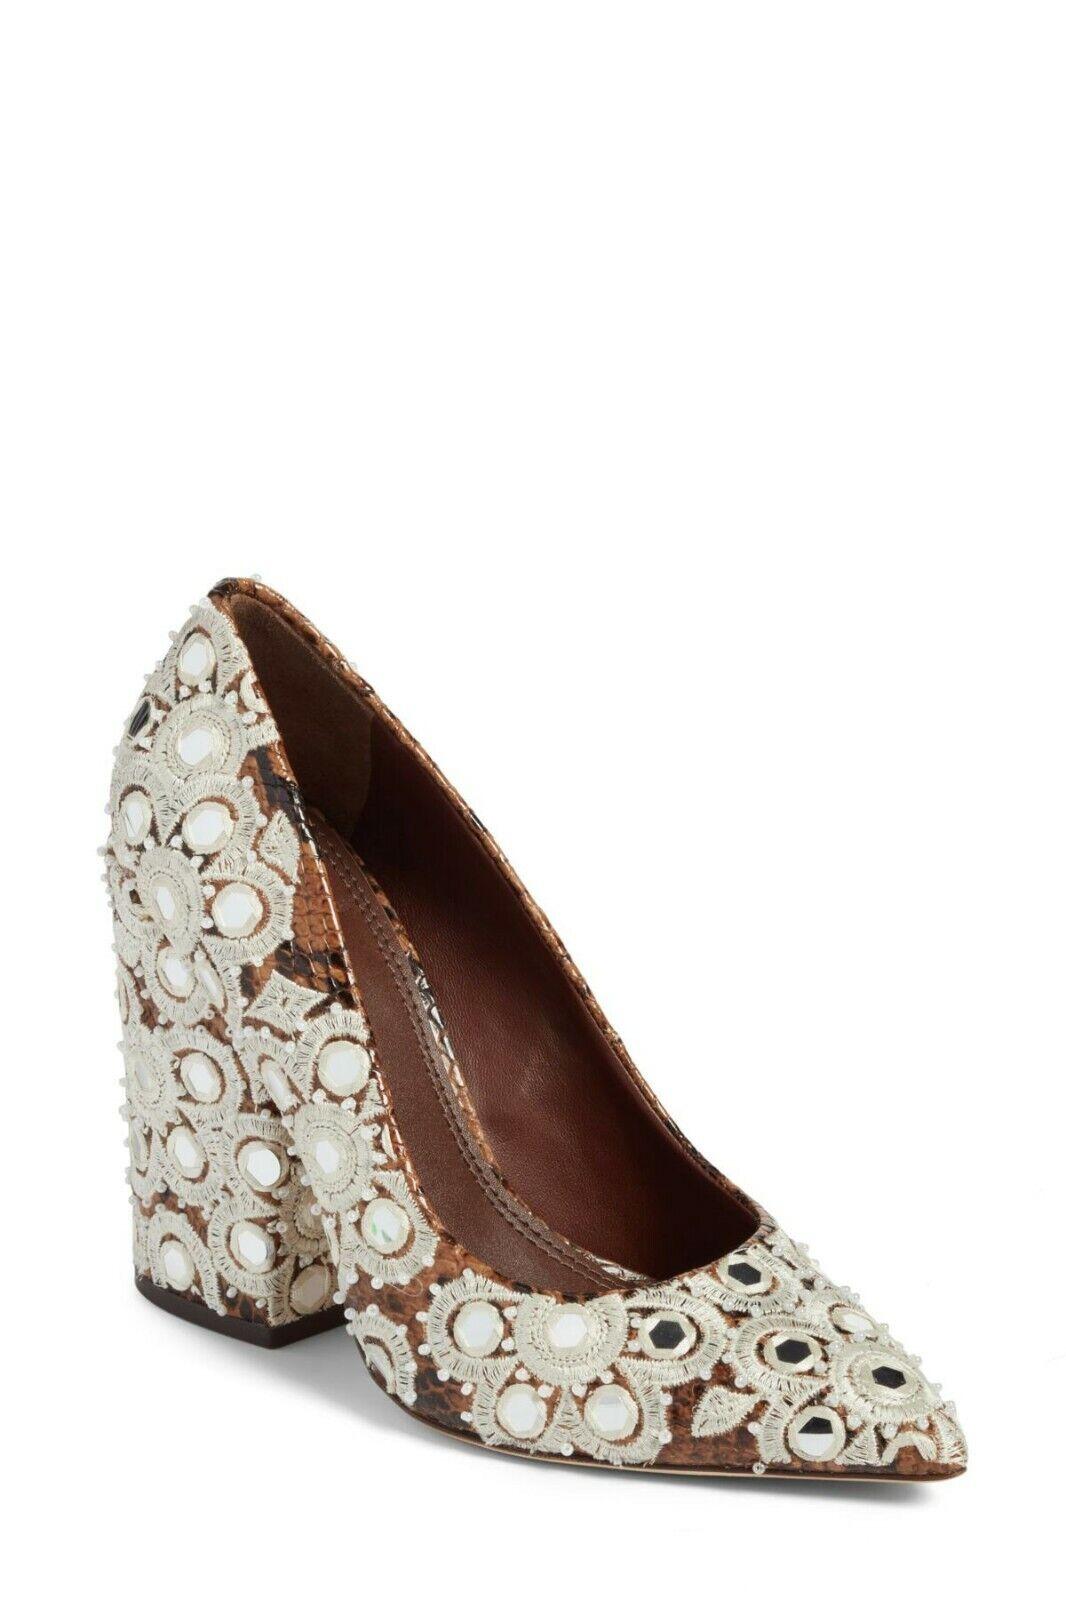 Tory Burch Francesca Pointy Toe Pump (Women) Textile and leather, Sz 10  698 NWB